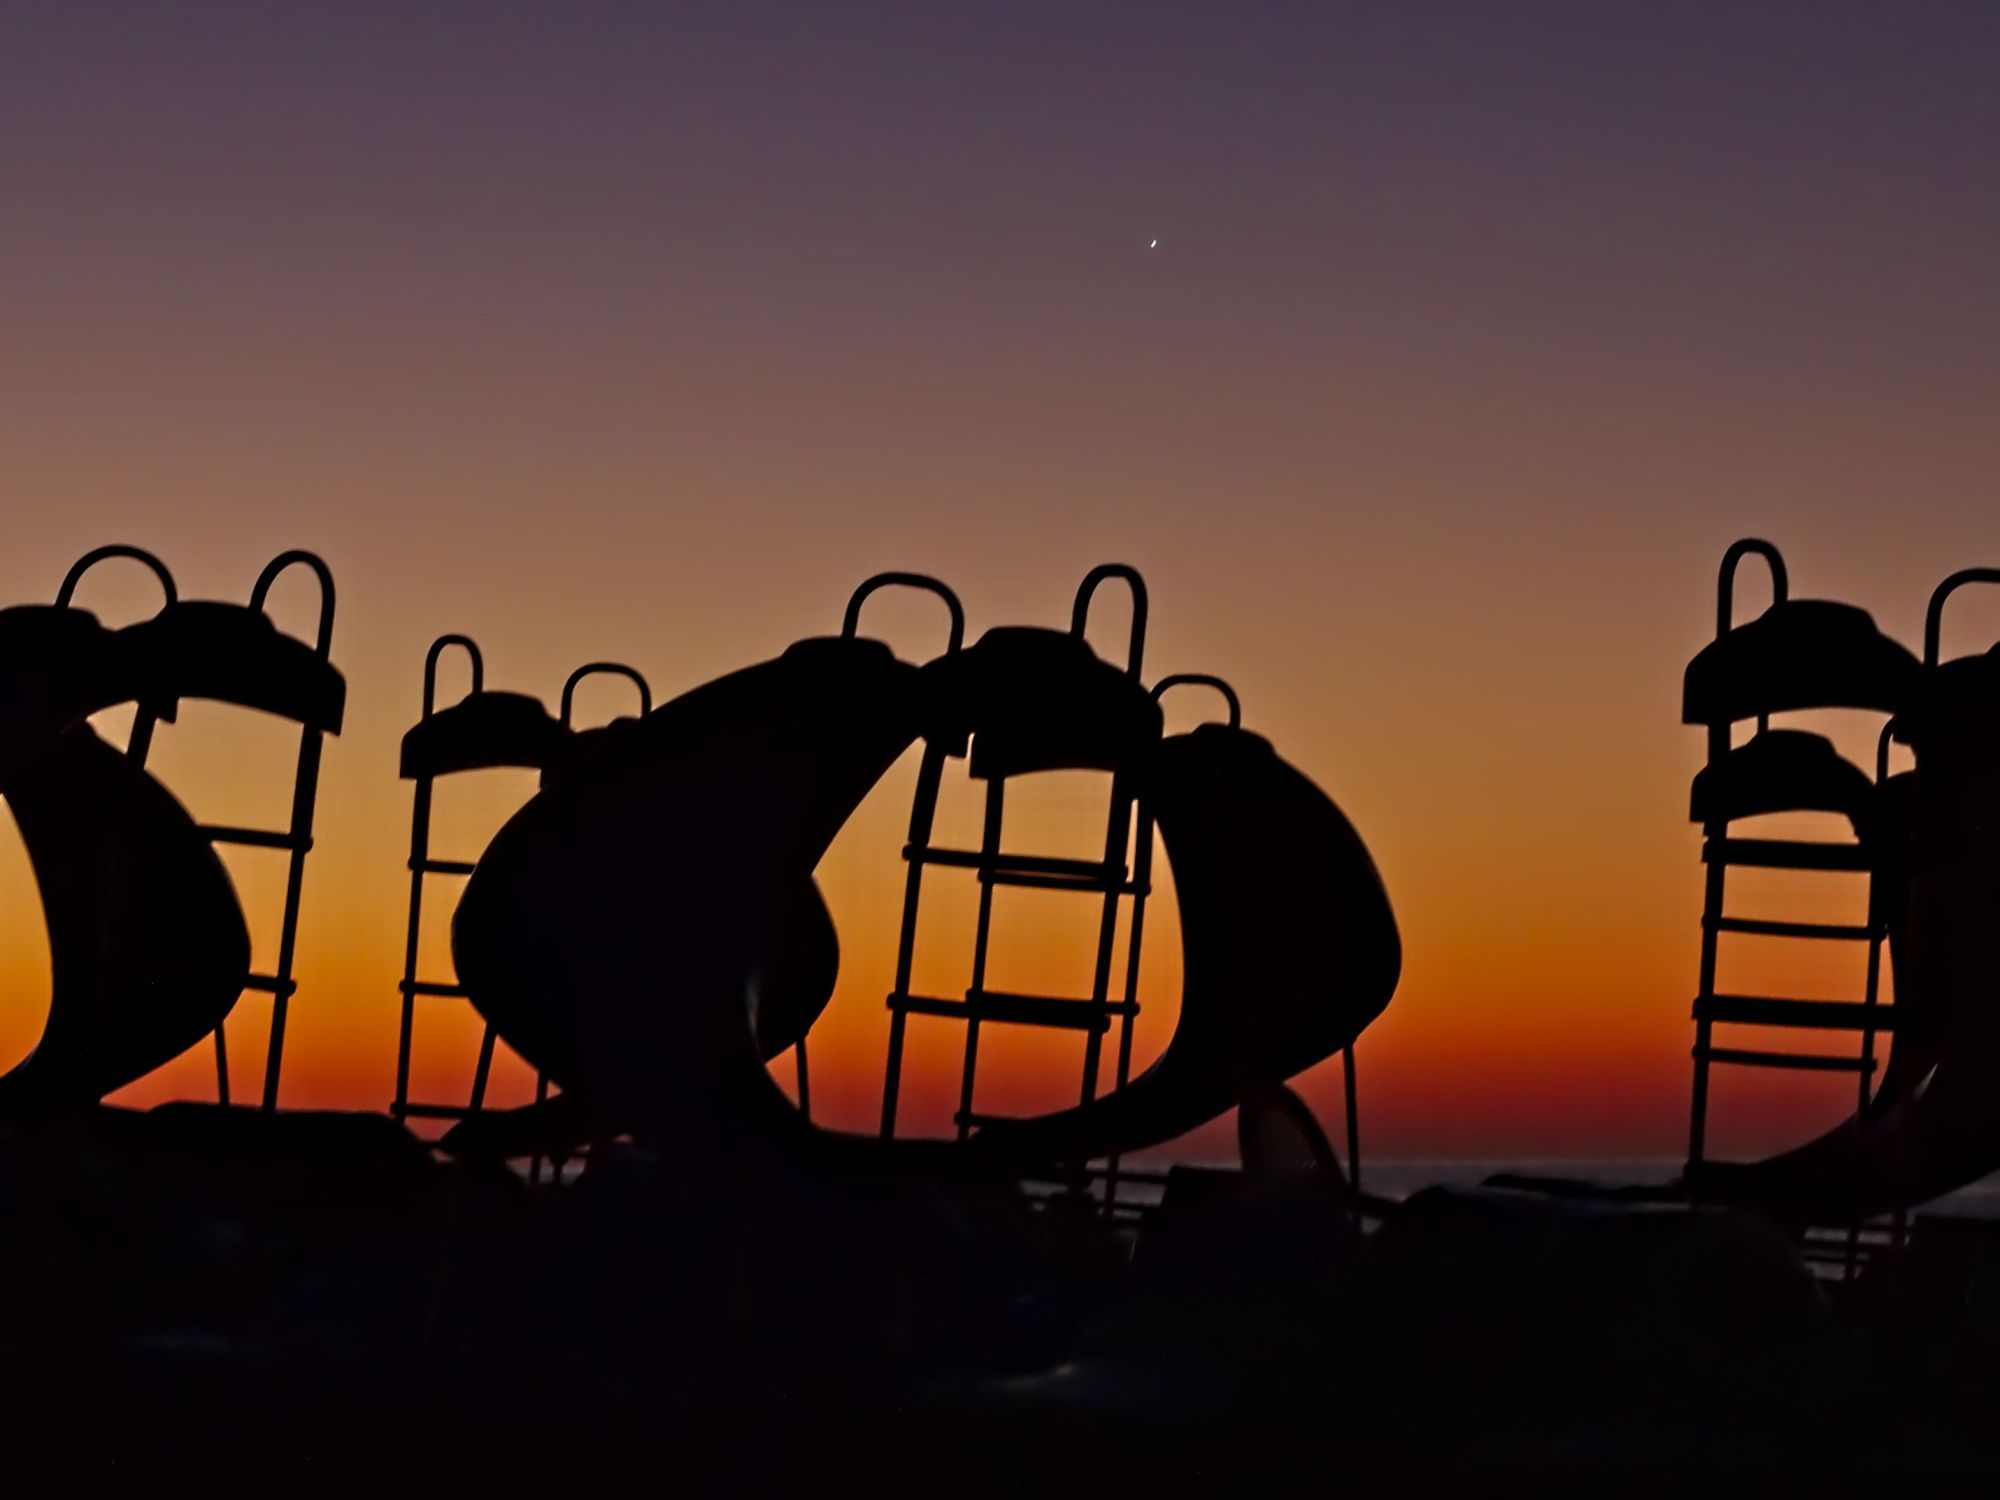 Beach Sunrise - Shapes in the Dawn